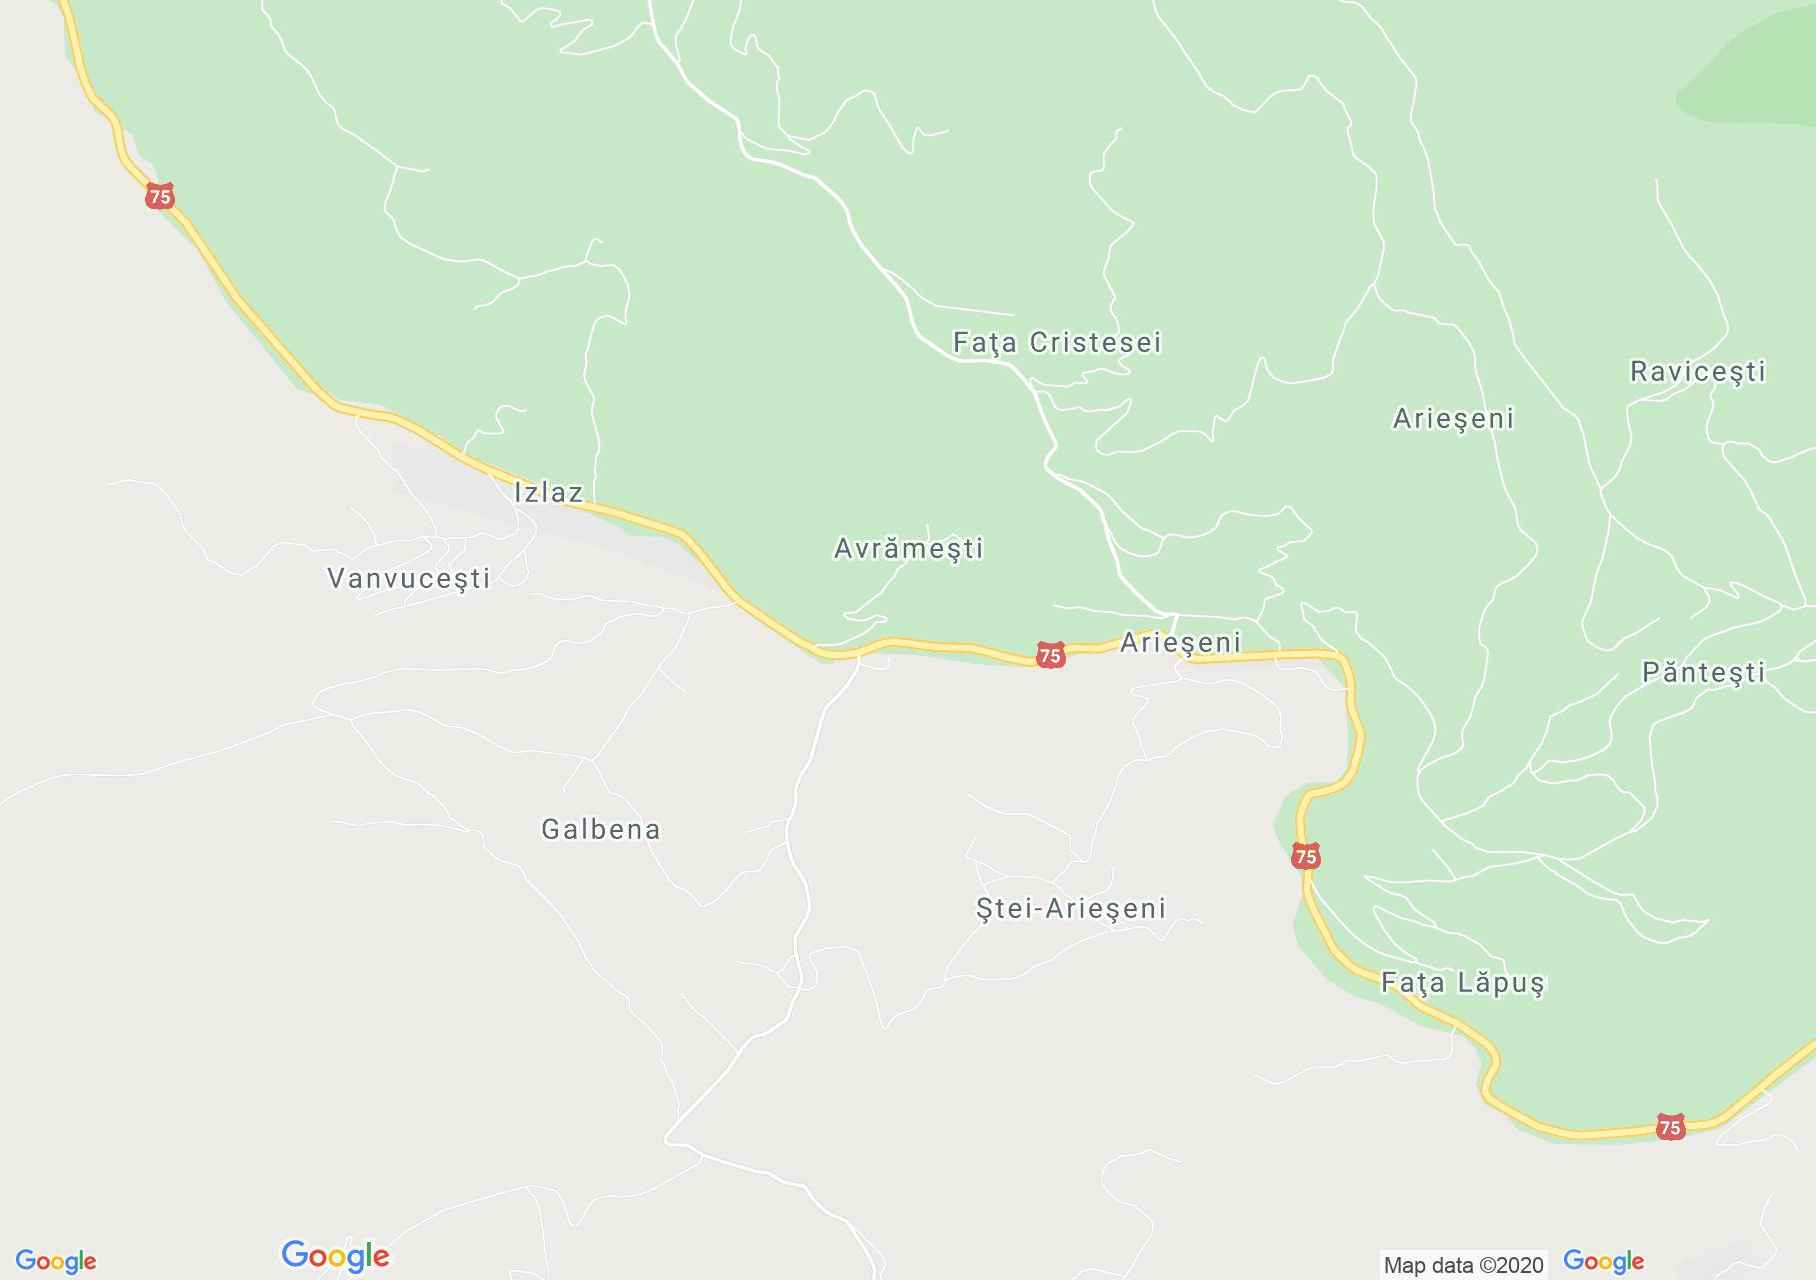 Lepus interaktív turista térképe.